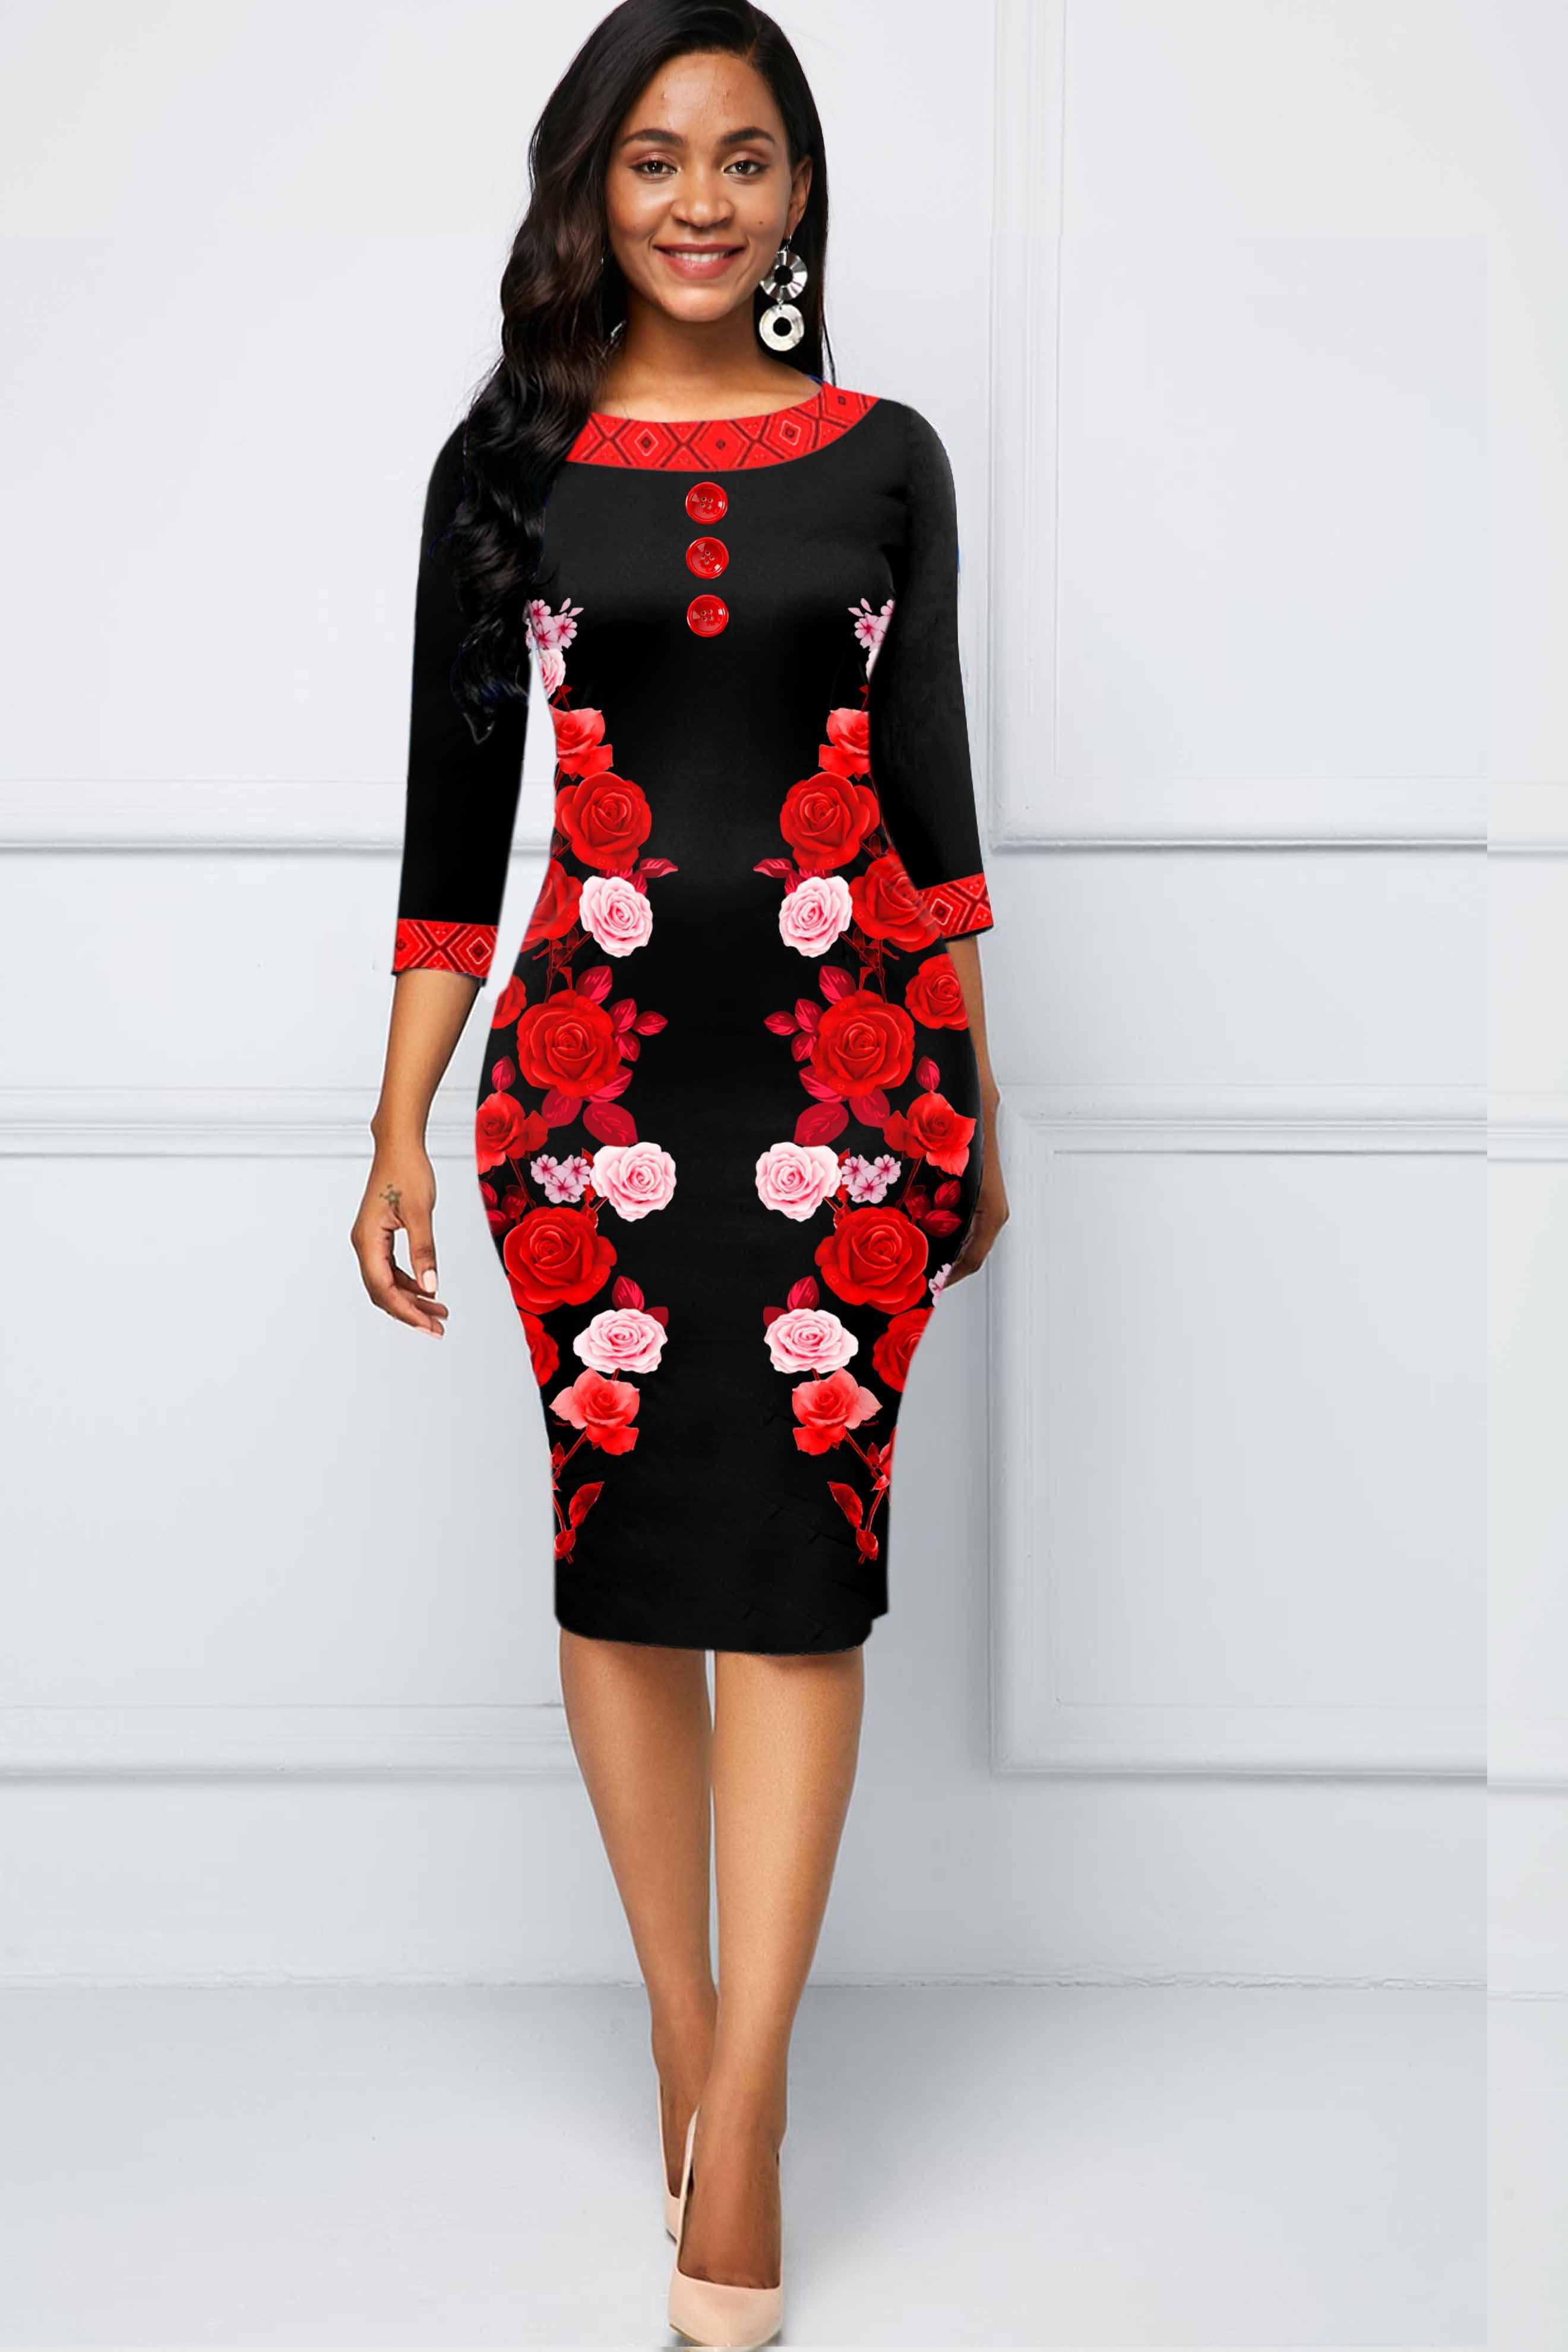 ROTITA Round Neck Three Quarter Sleeve Floral Print Dress